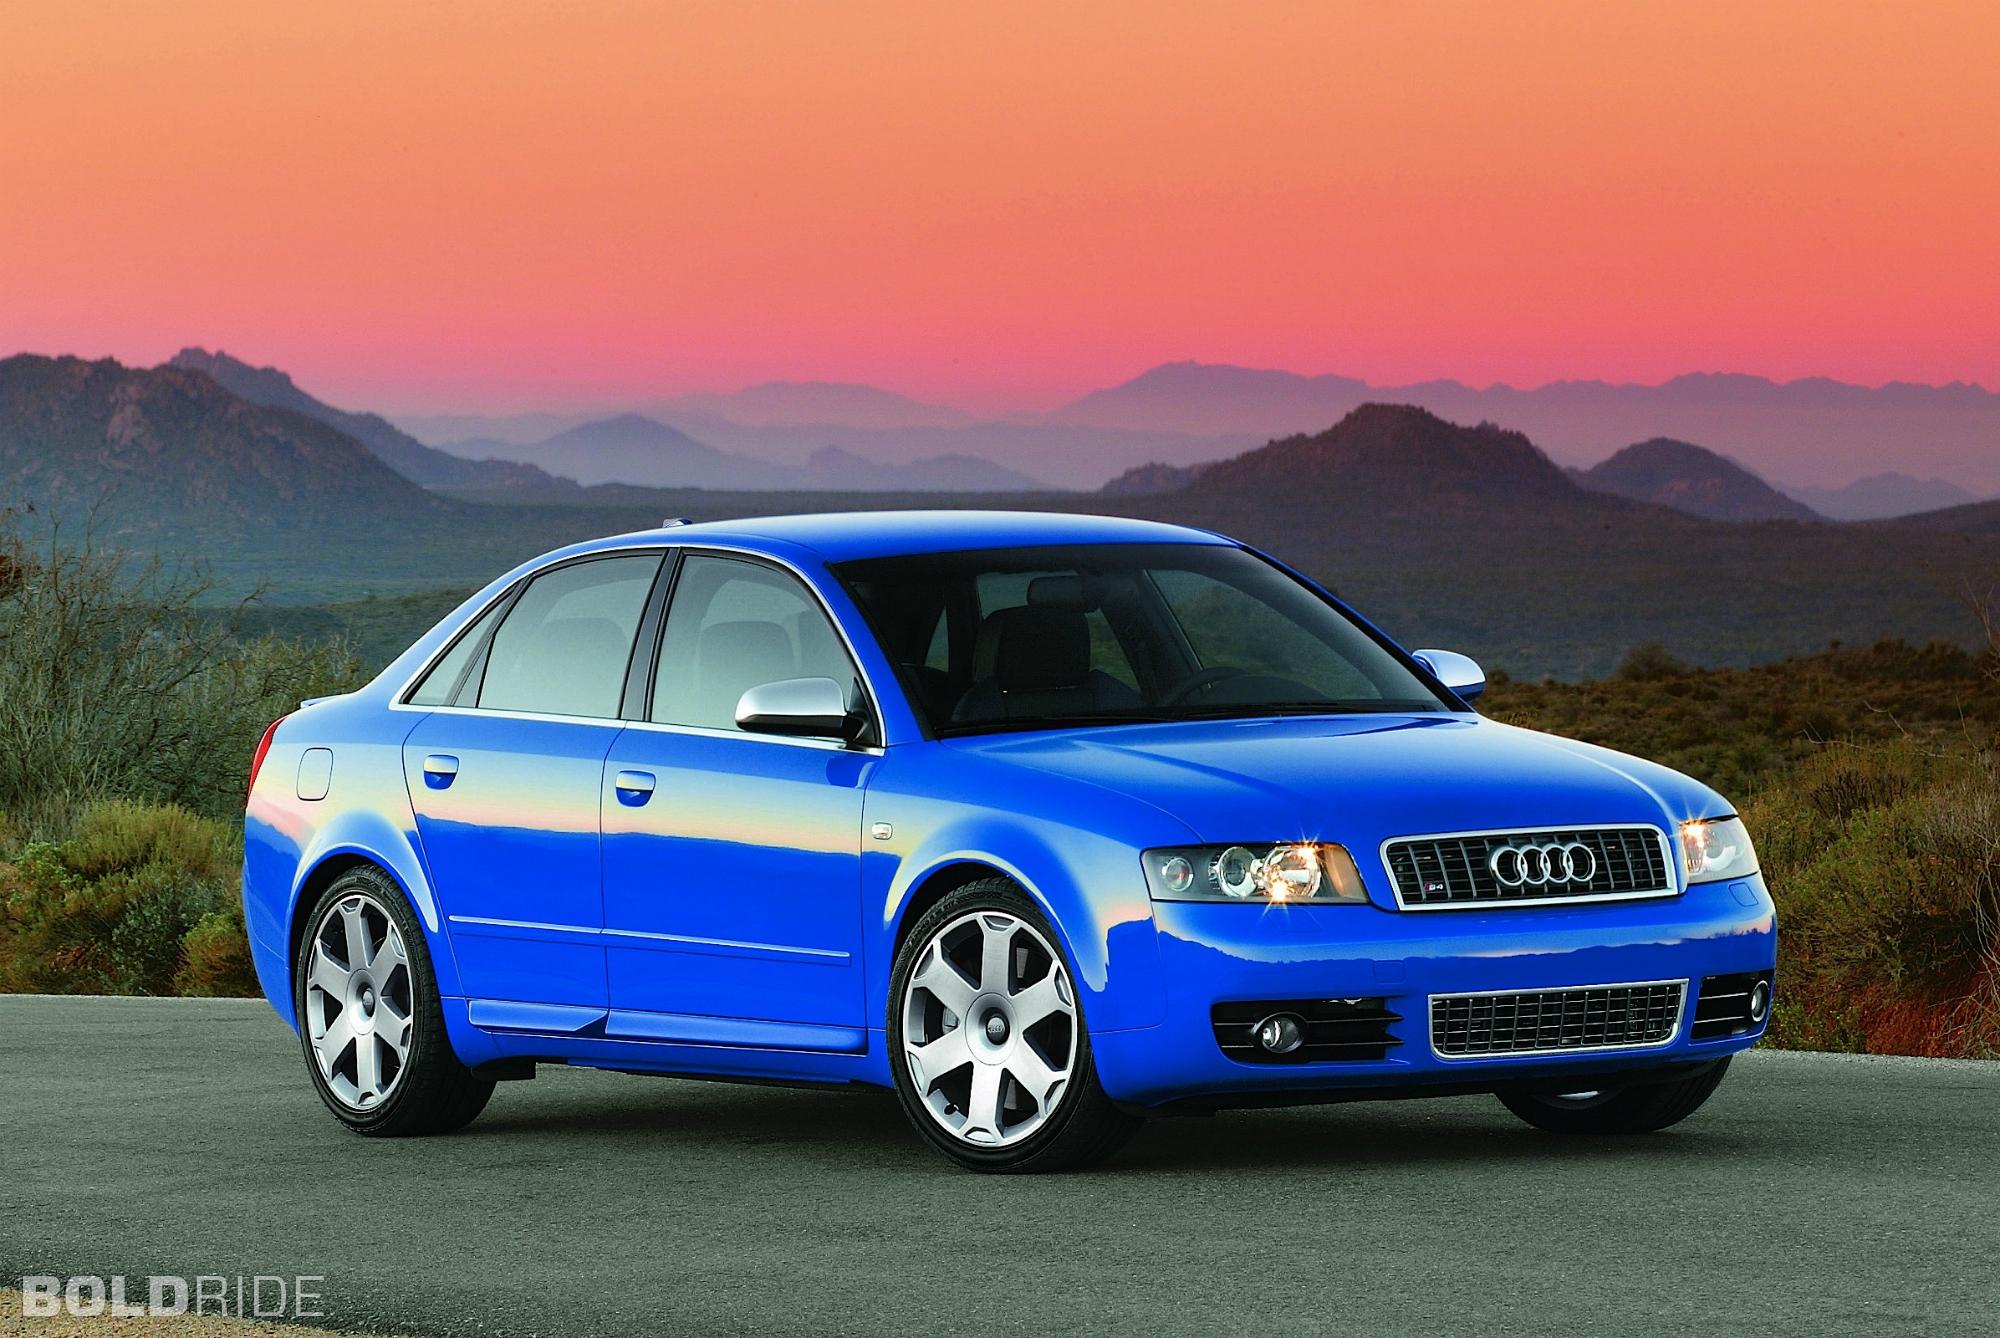 2002 Audi S4 Image 23